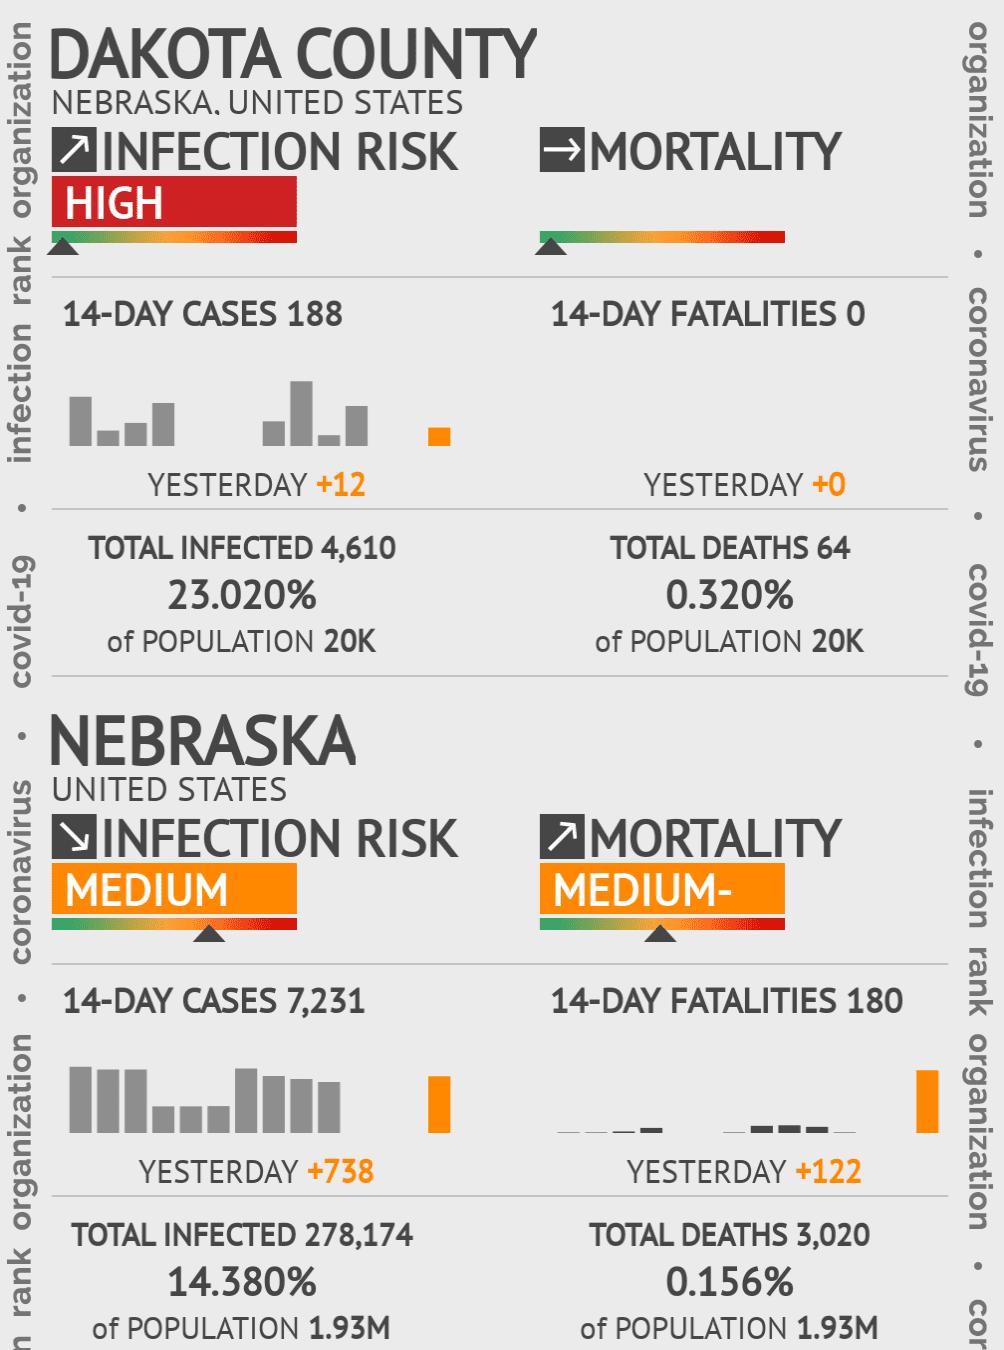 Dakota County Coronavirus Covid-19 Risk of Infection on March 23, 2021